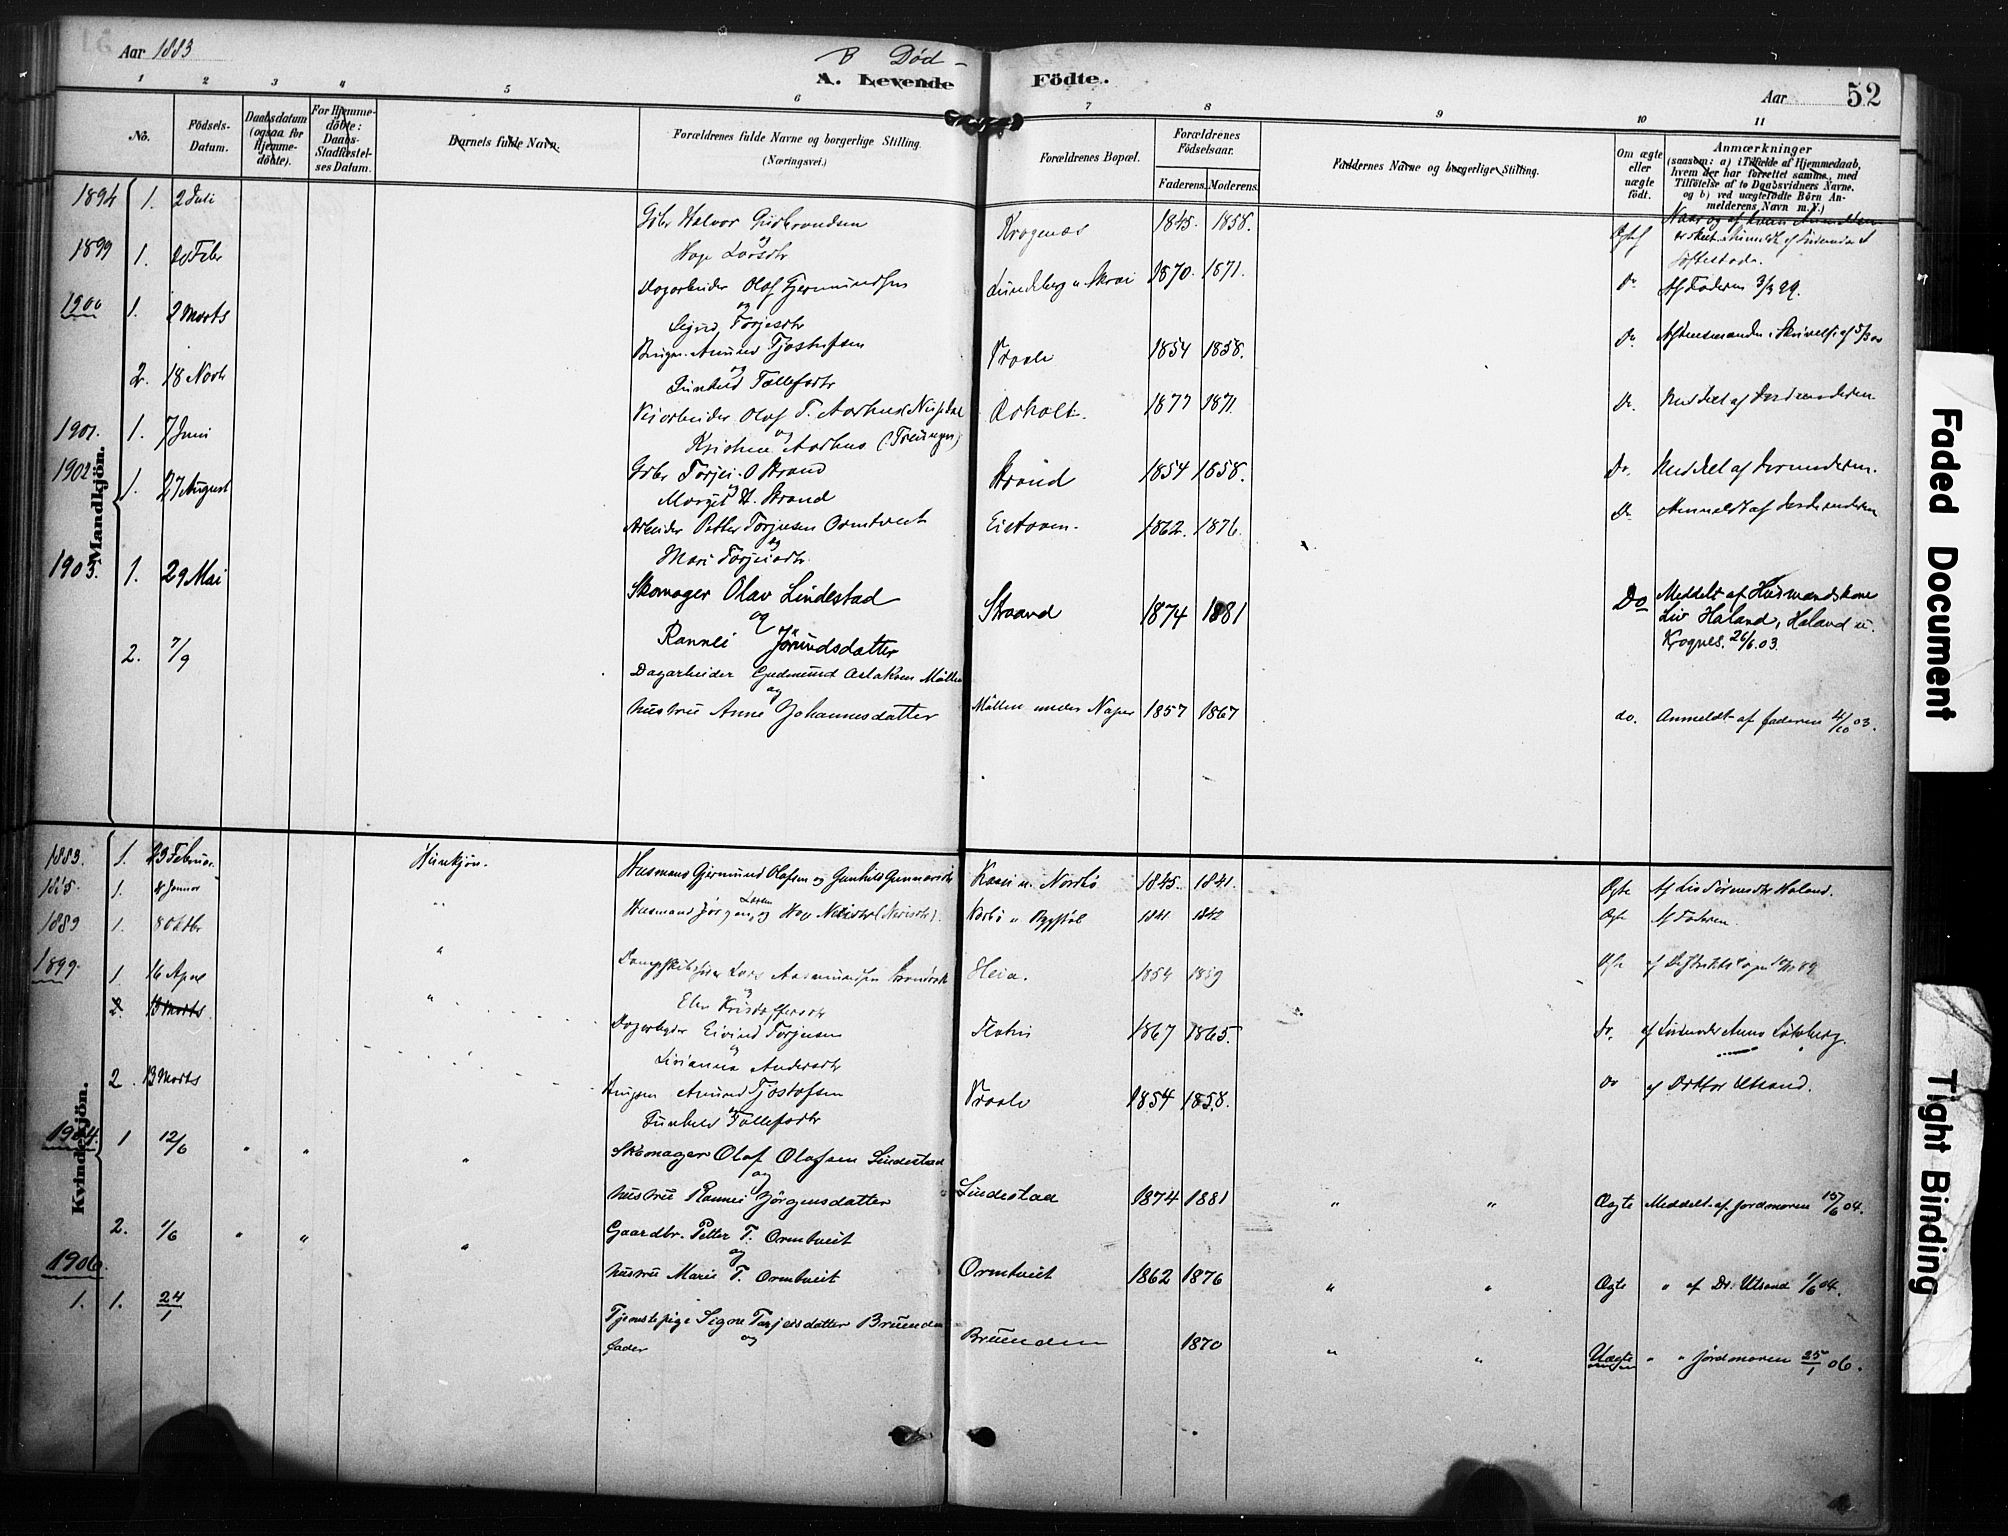 SAKO, Kviteseid kirkebøker, F/Fc/L0002: Ministerialbok nr. III 2, 1882-1908, s. 52